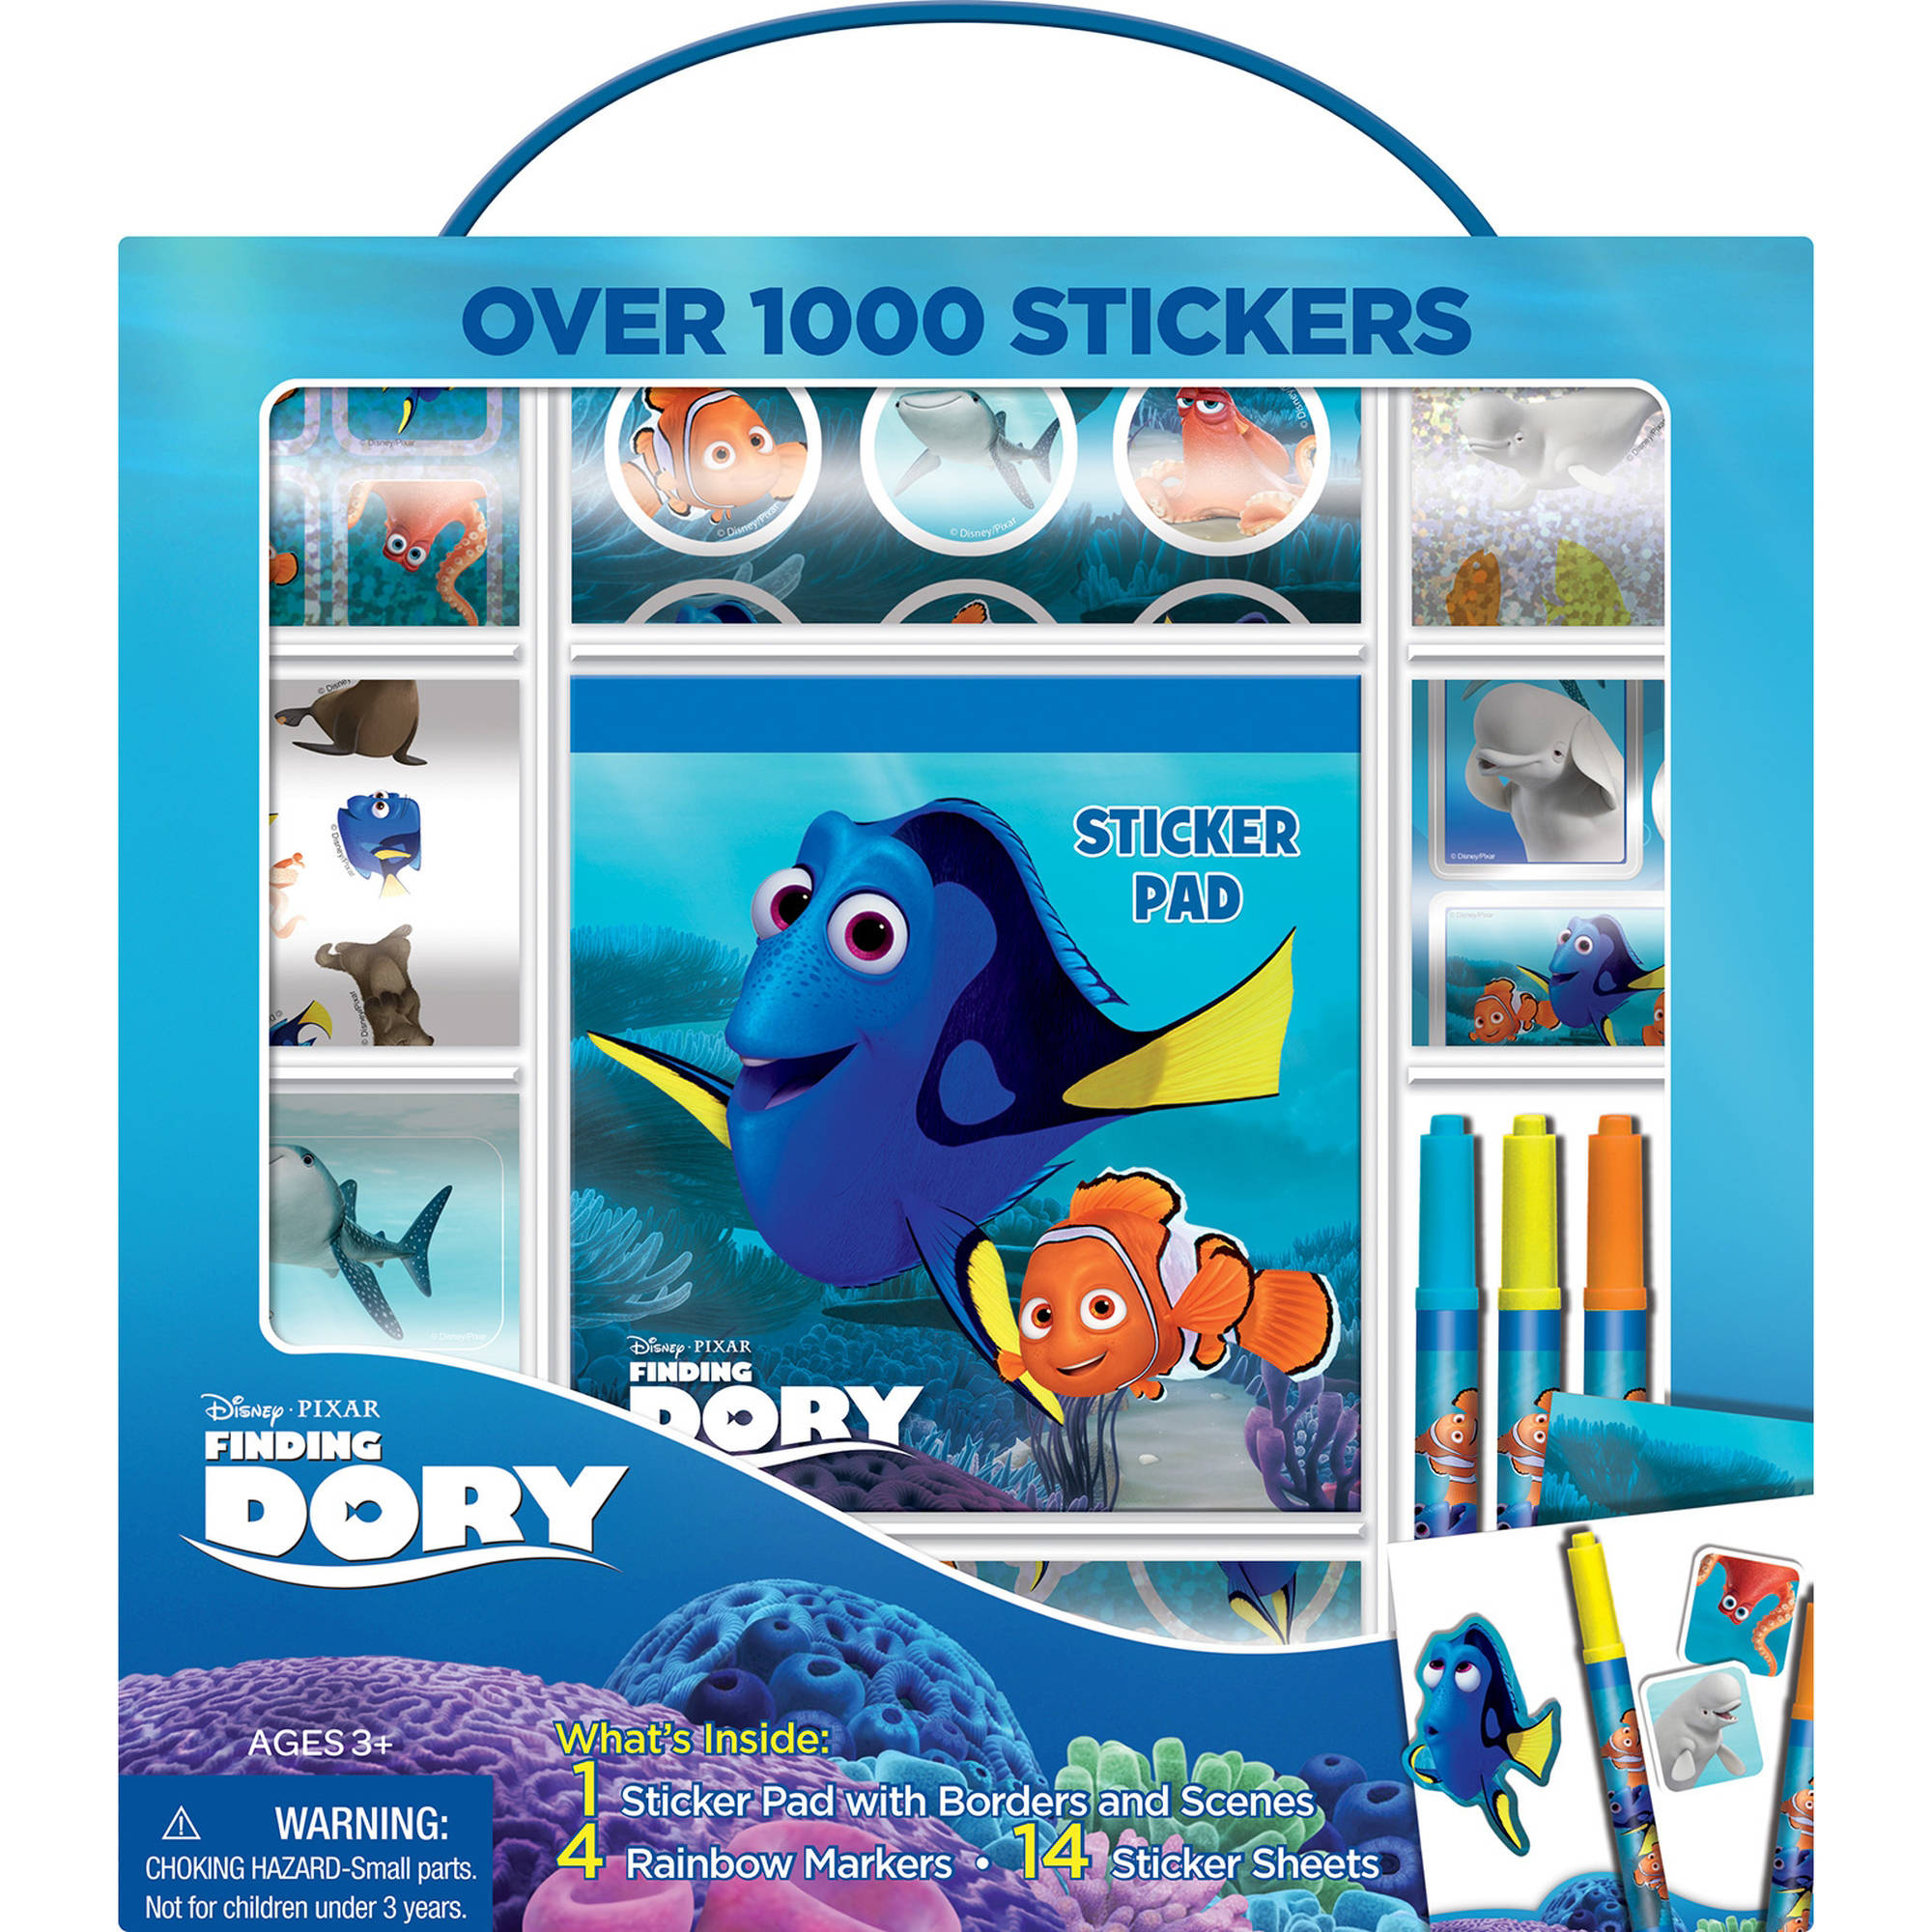 Bendon Disney PIXAR Finding Dory Sticker Box